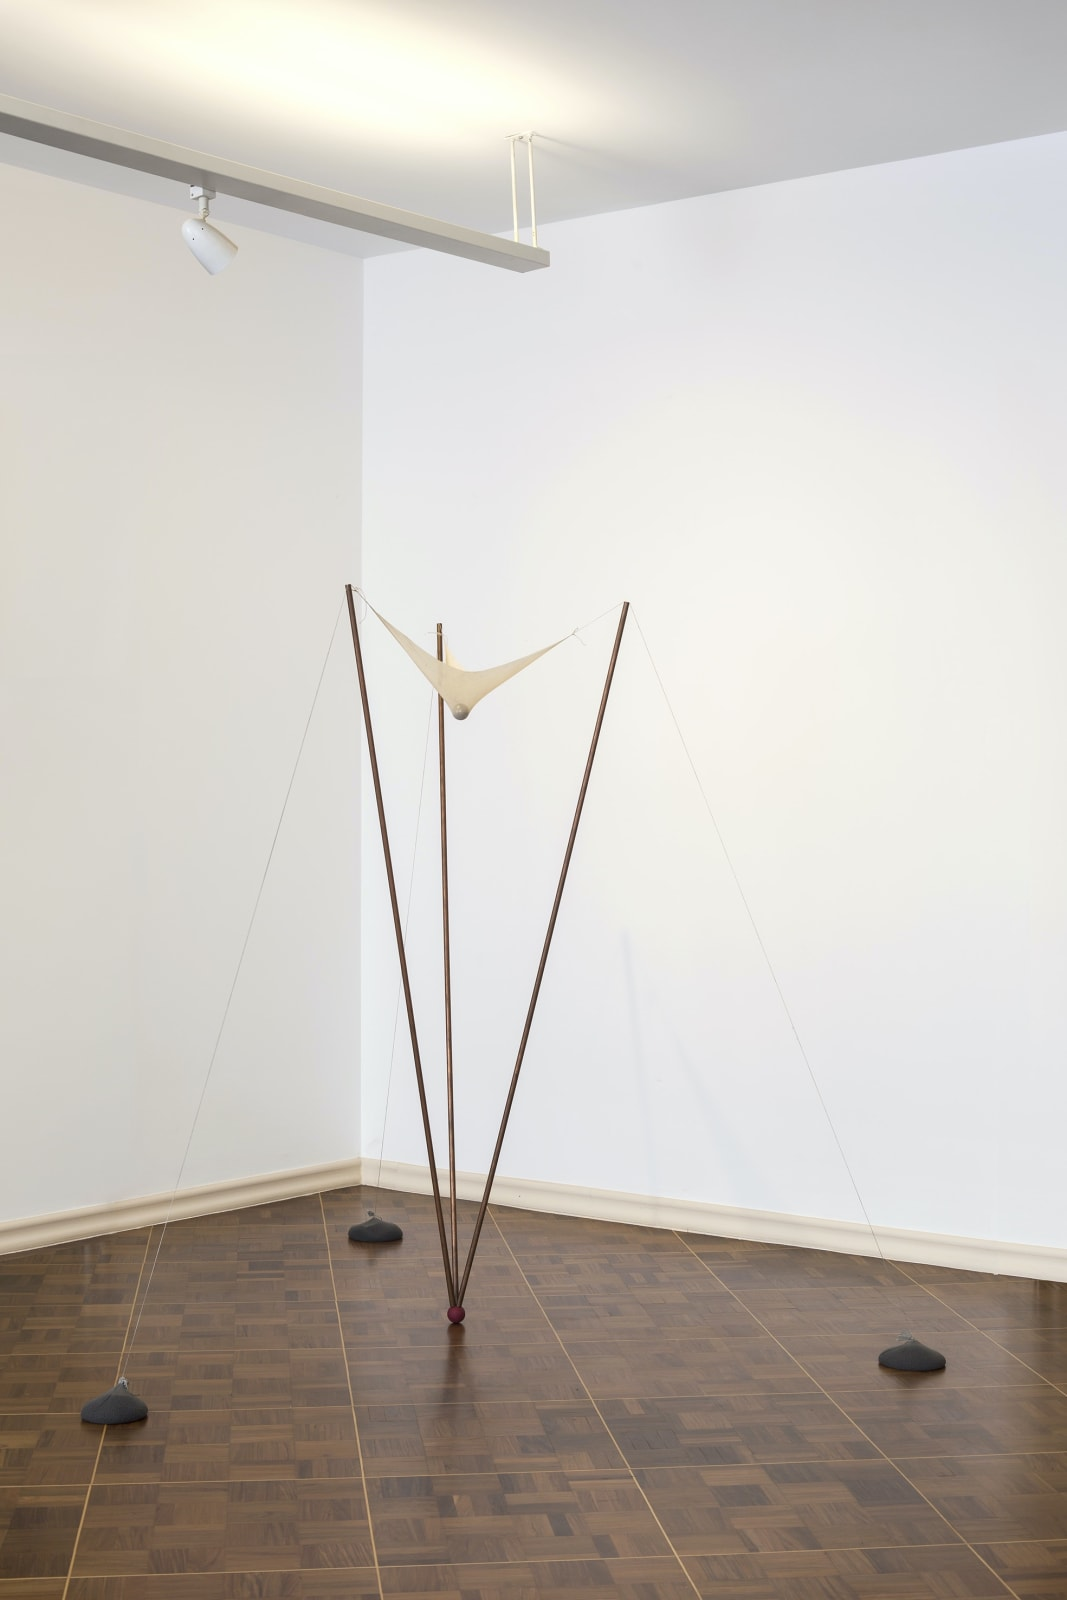 Ernesto Neto Sem título, 1997 Cobre, tecido, poliamida, borracha 170 x 175 x 180 cm